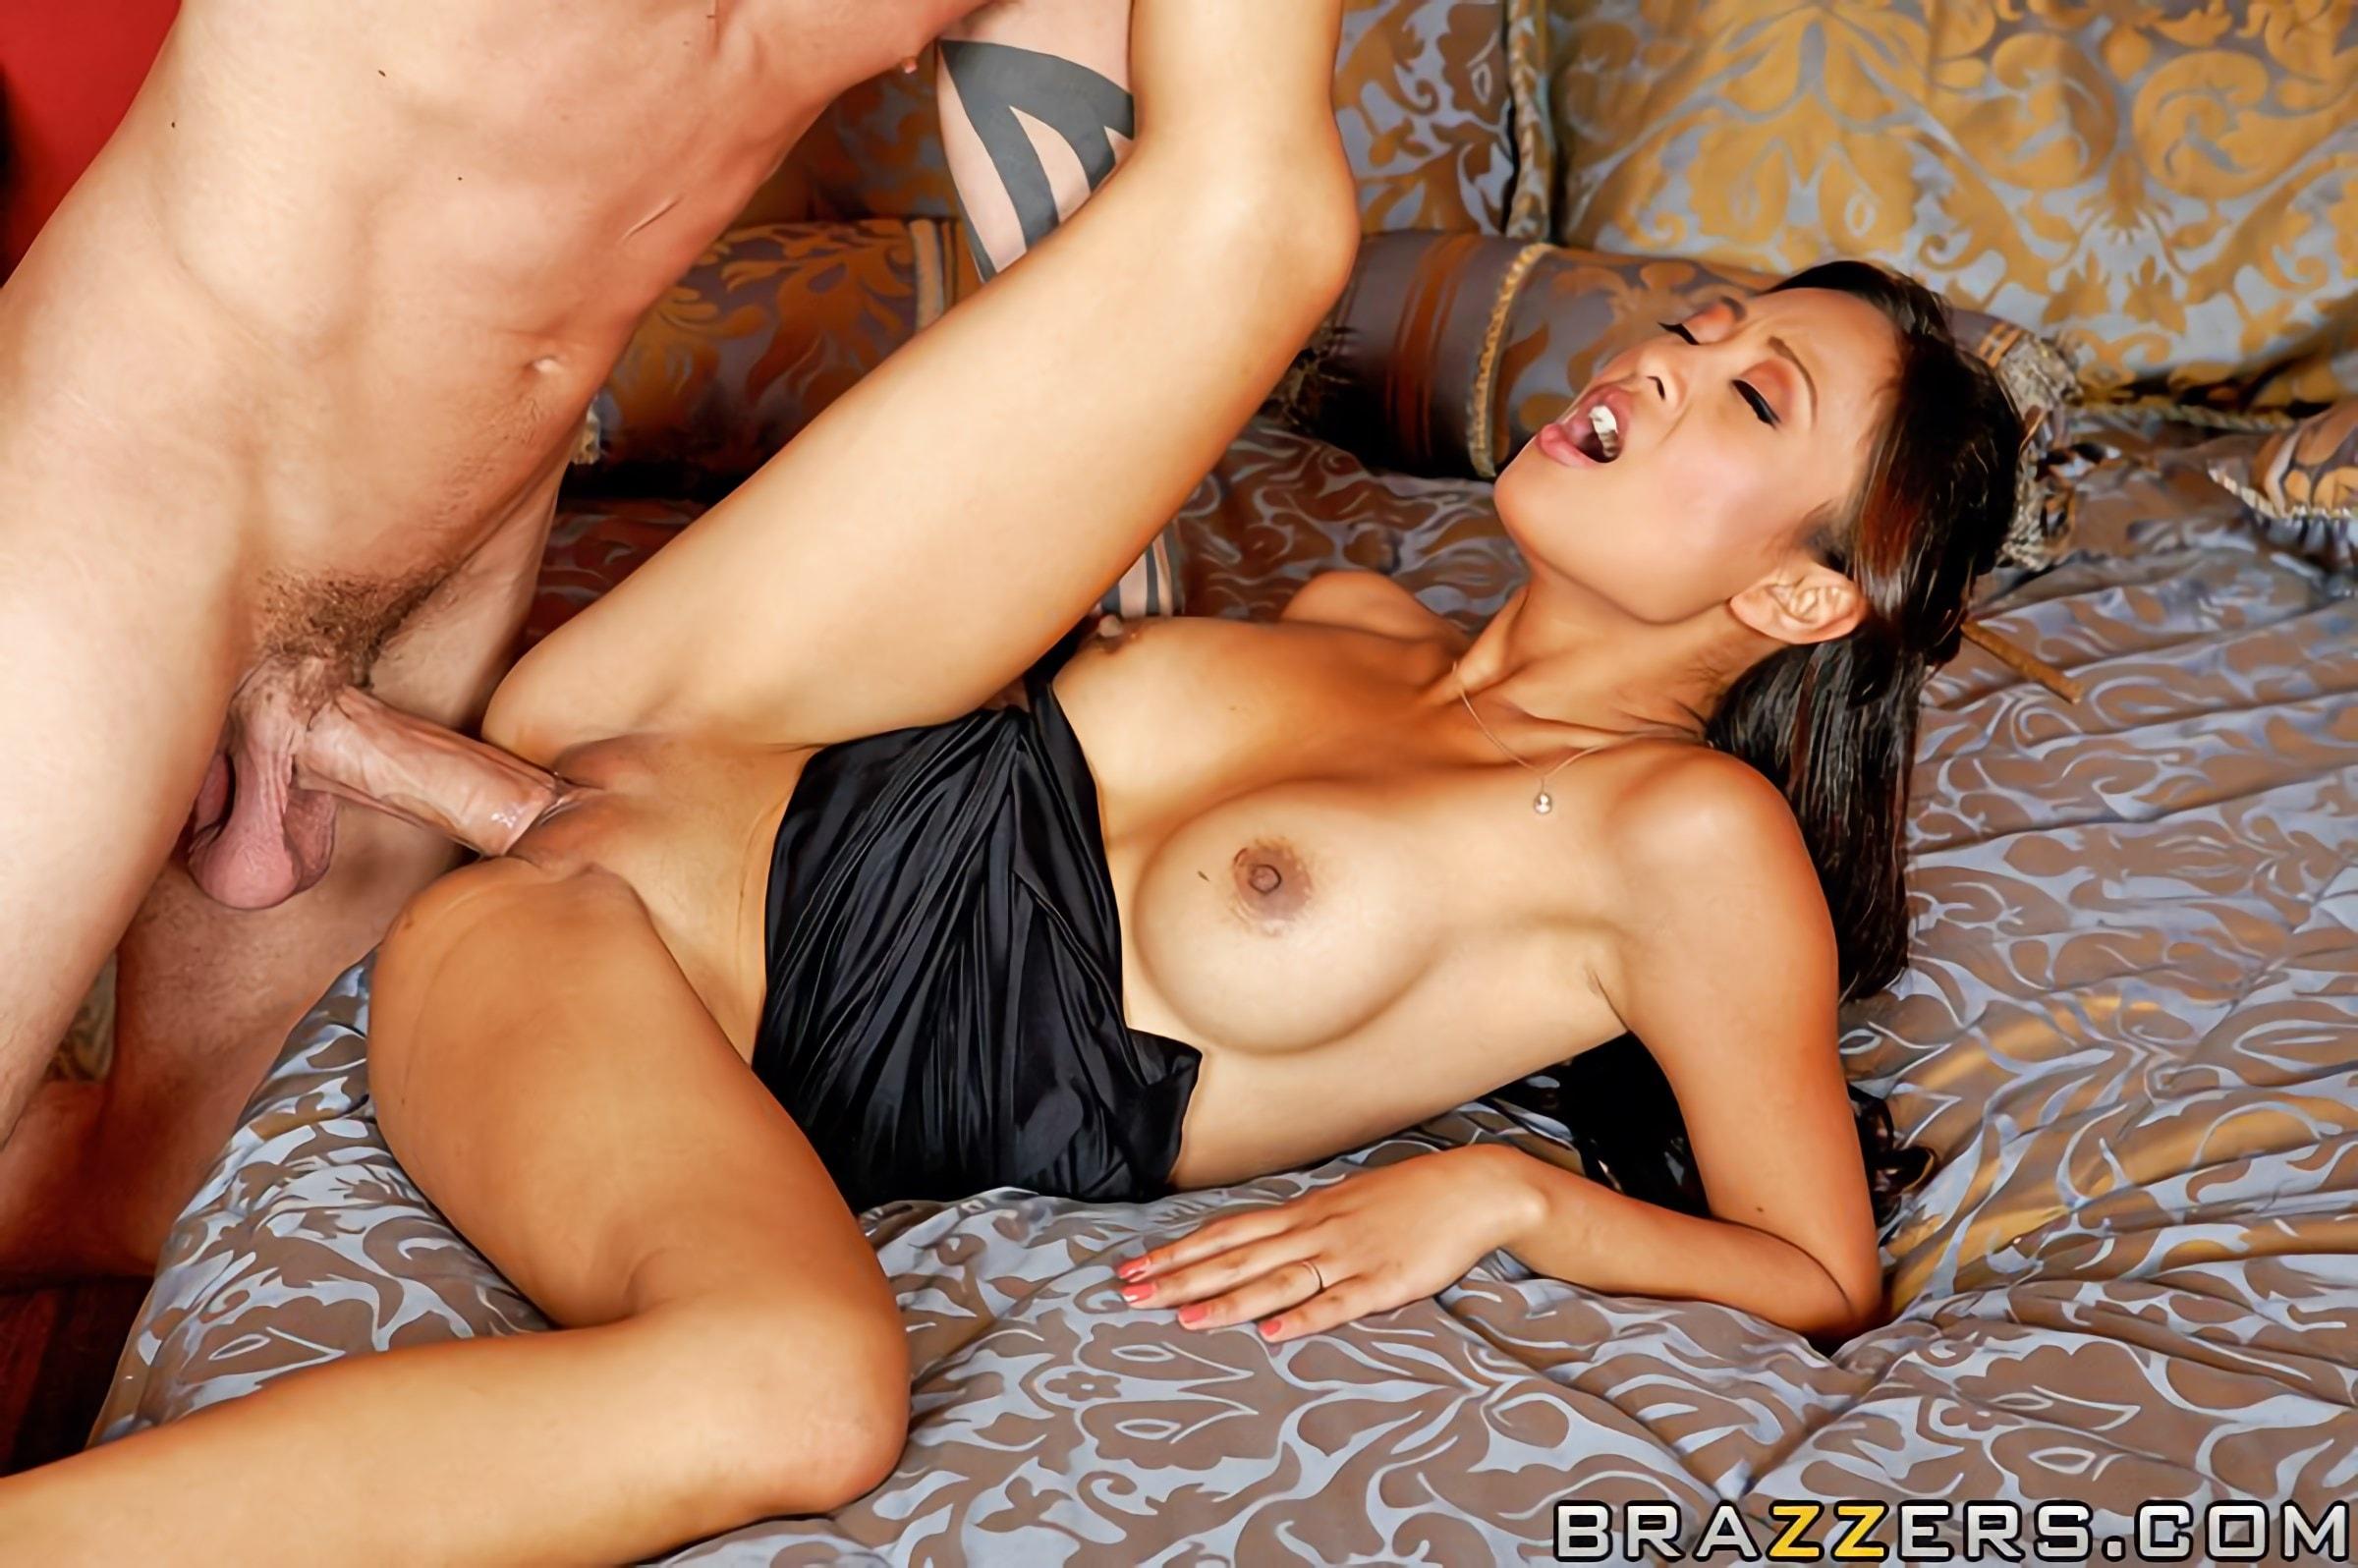 Порно фото качество категории